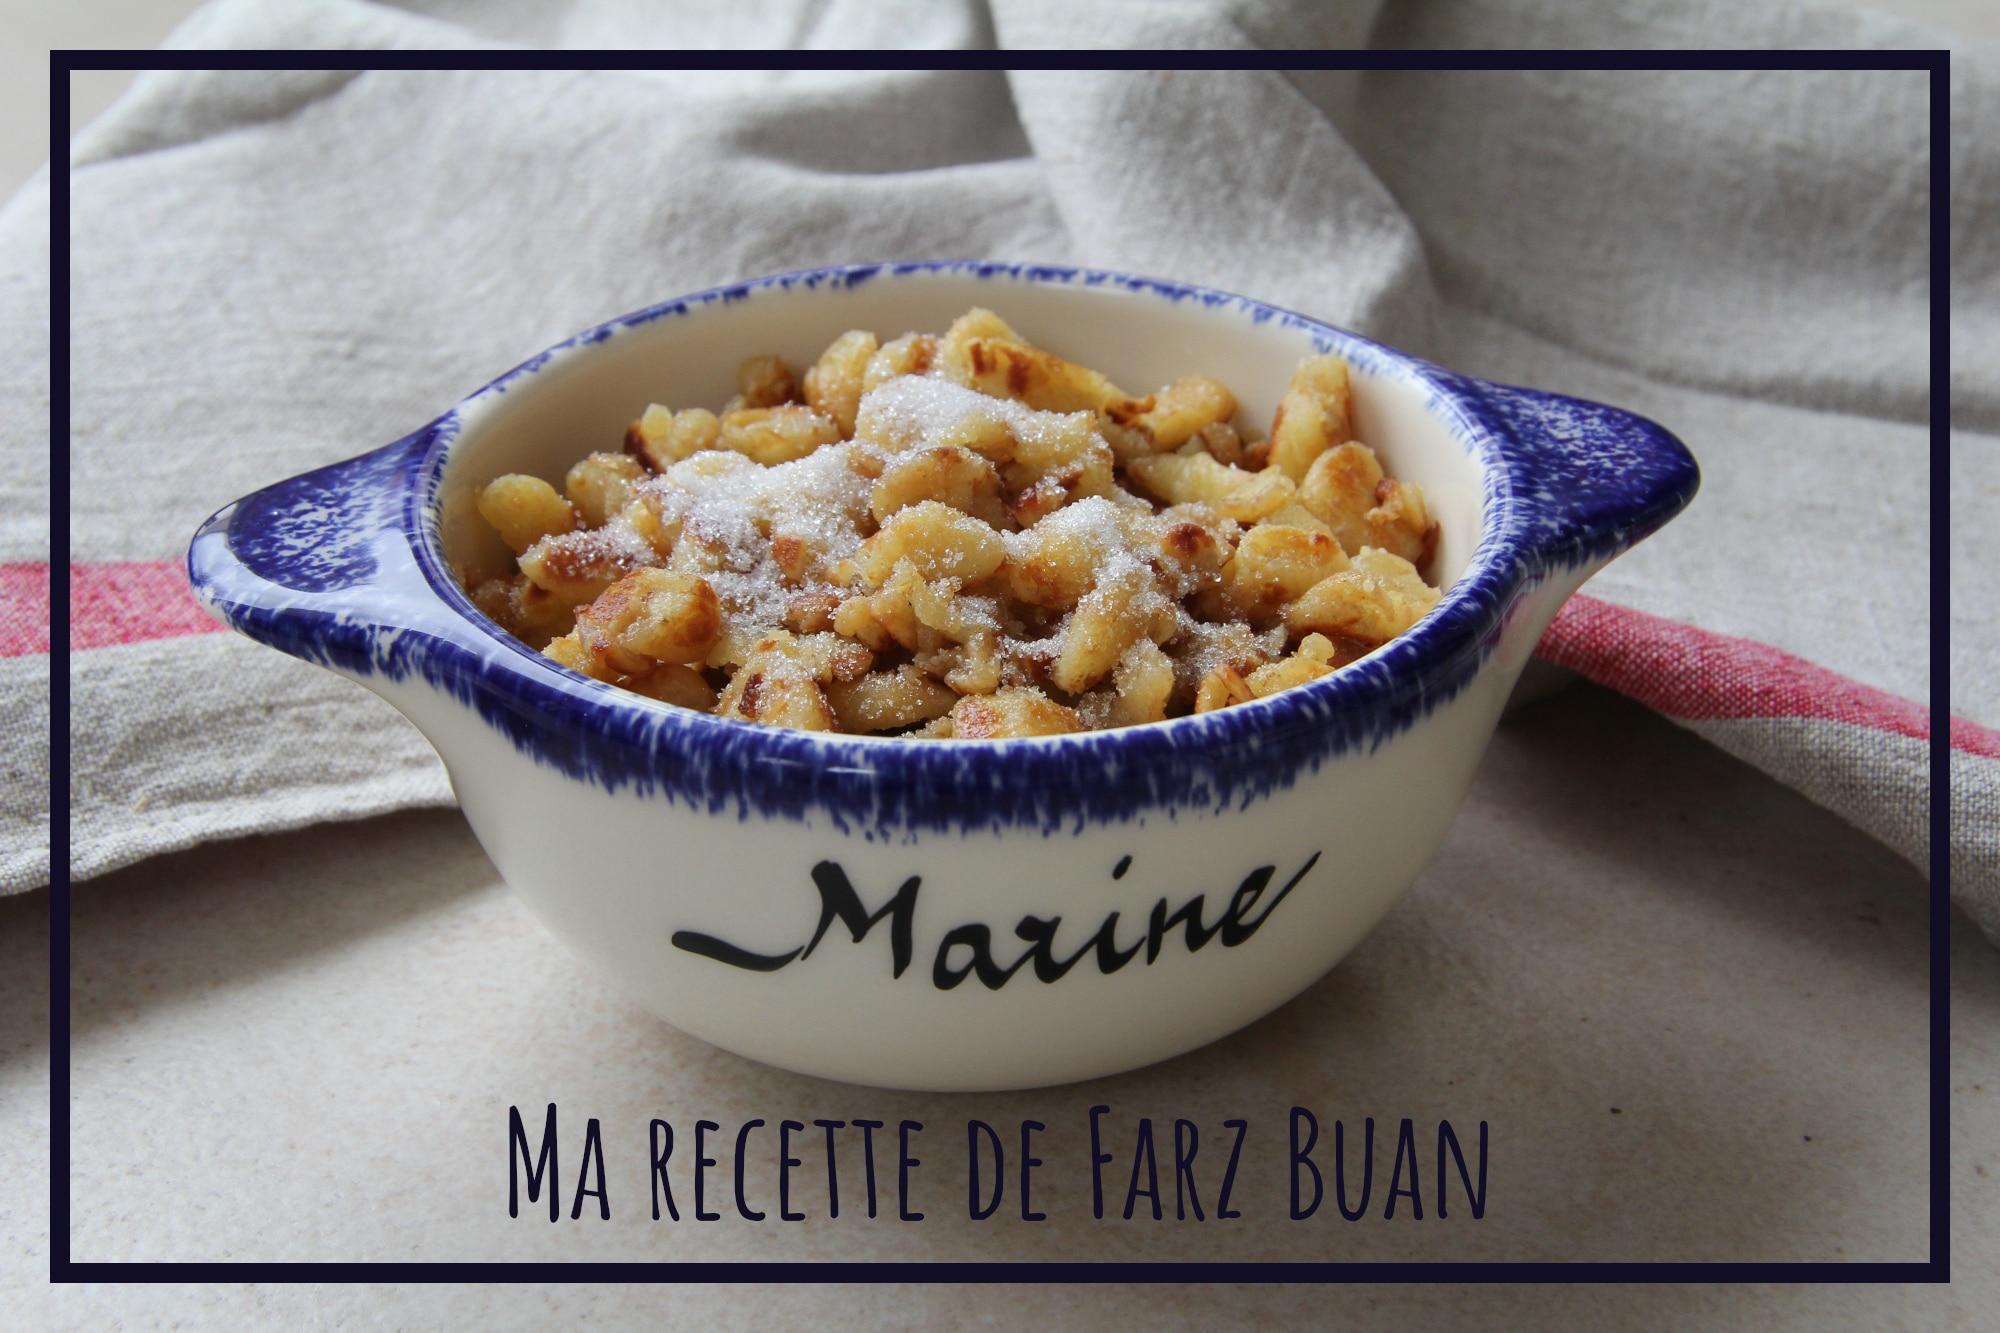 You are currently viewing Recette de farz buan, gourmandise bretonne